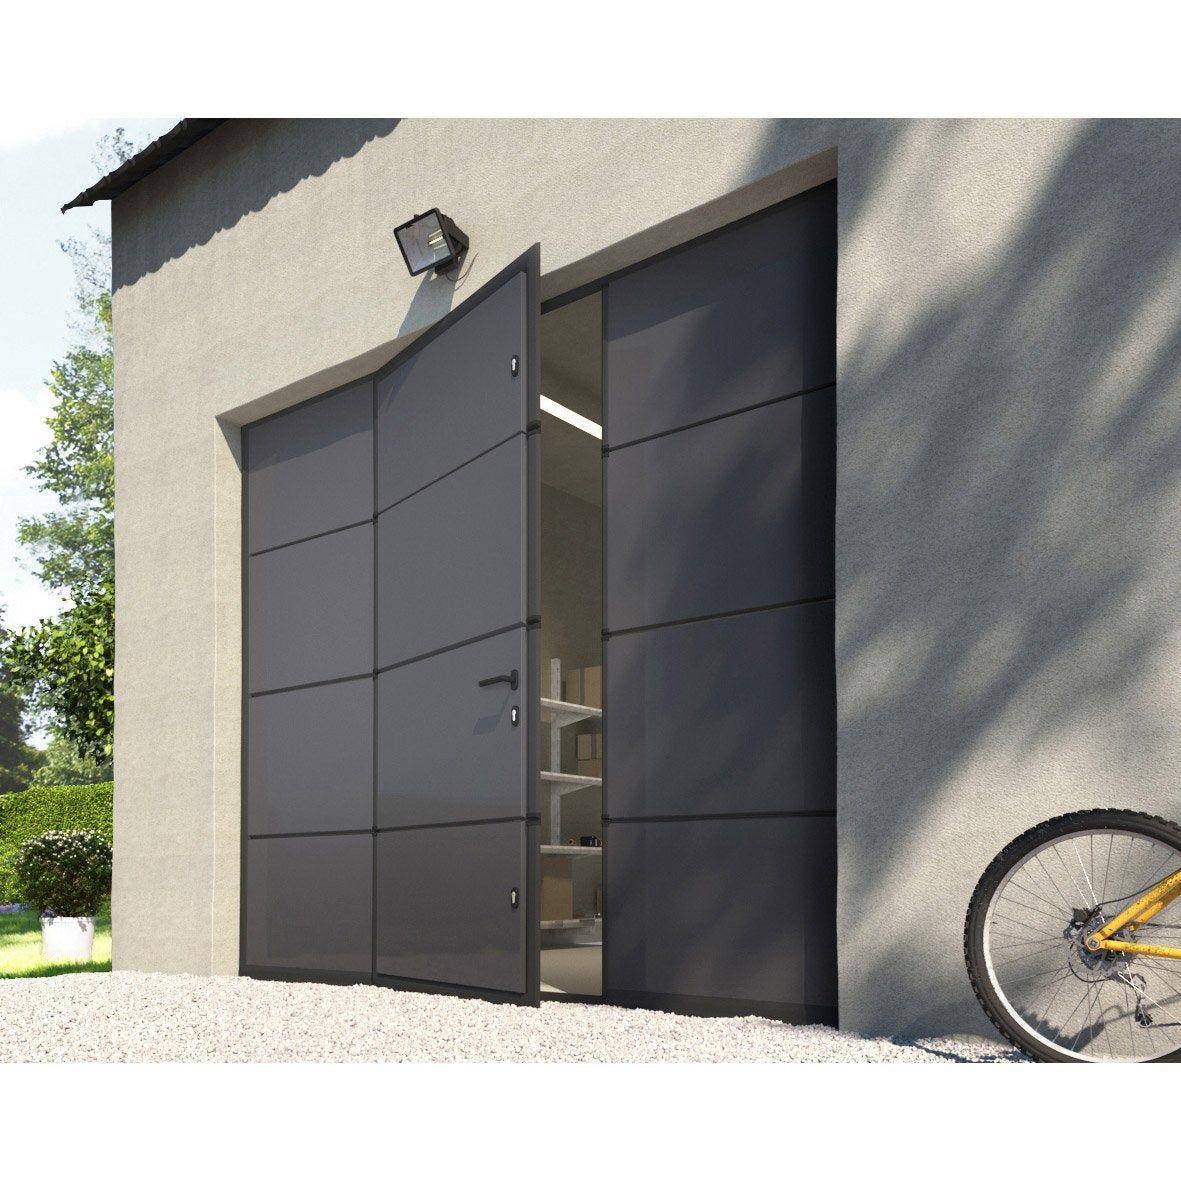 Porte De Garage Sectionnelle Motorisee Artens Essentiel 200x240cm Avec Portillon Leroy Merlin In 2020 Garage Doors Garage Transformation Sectional Garage Doors